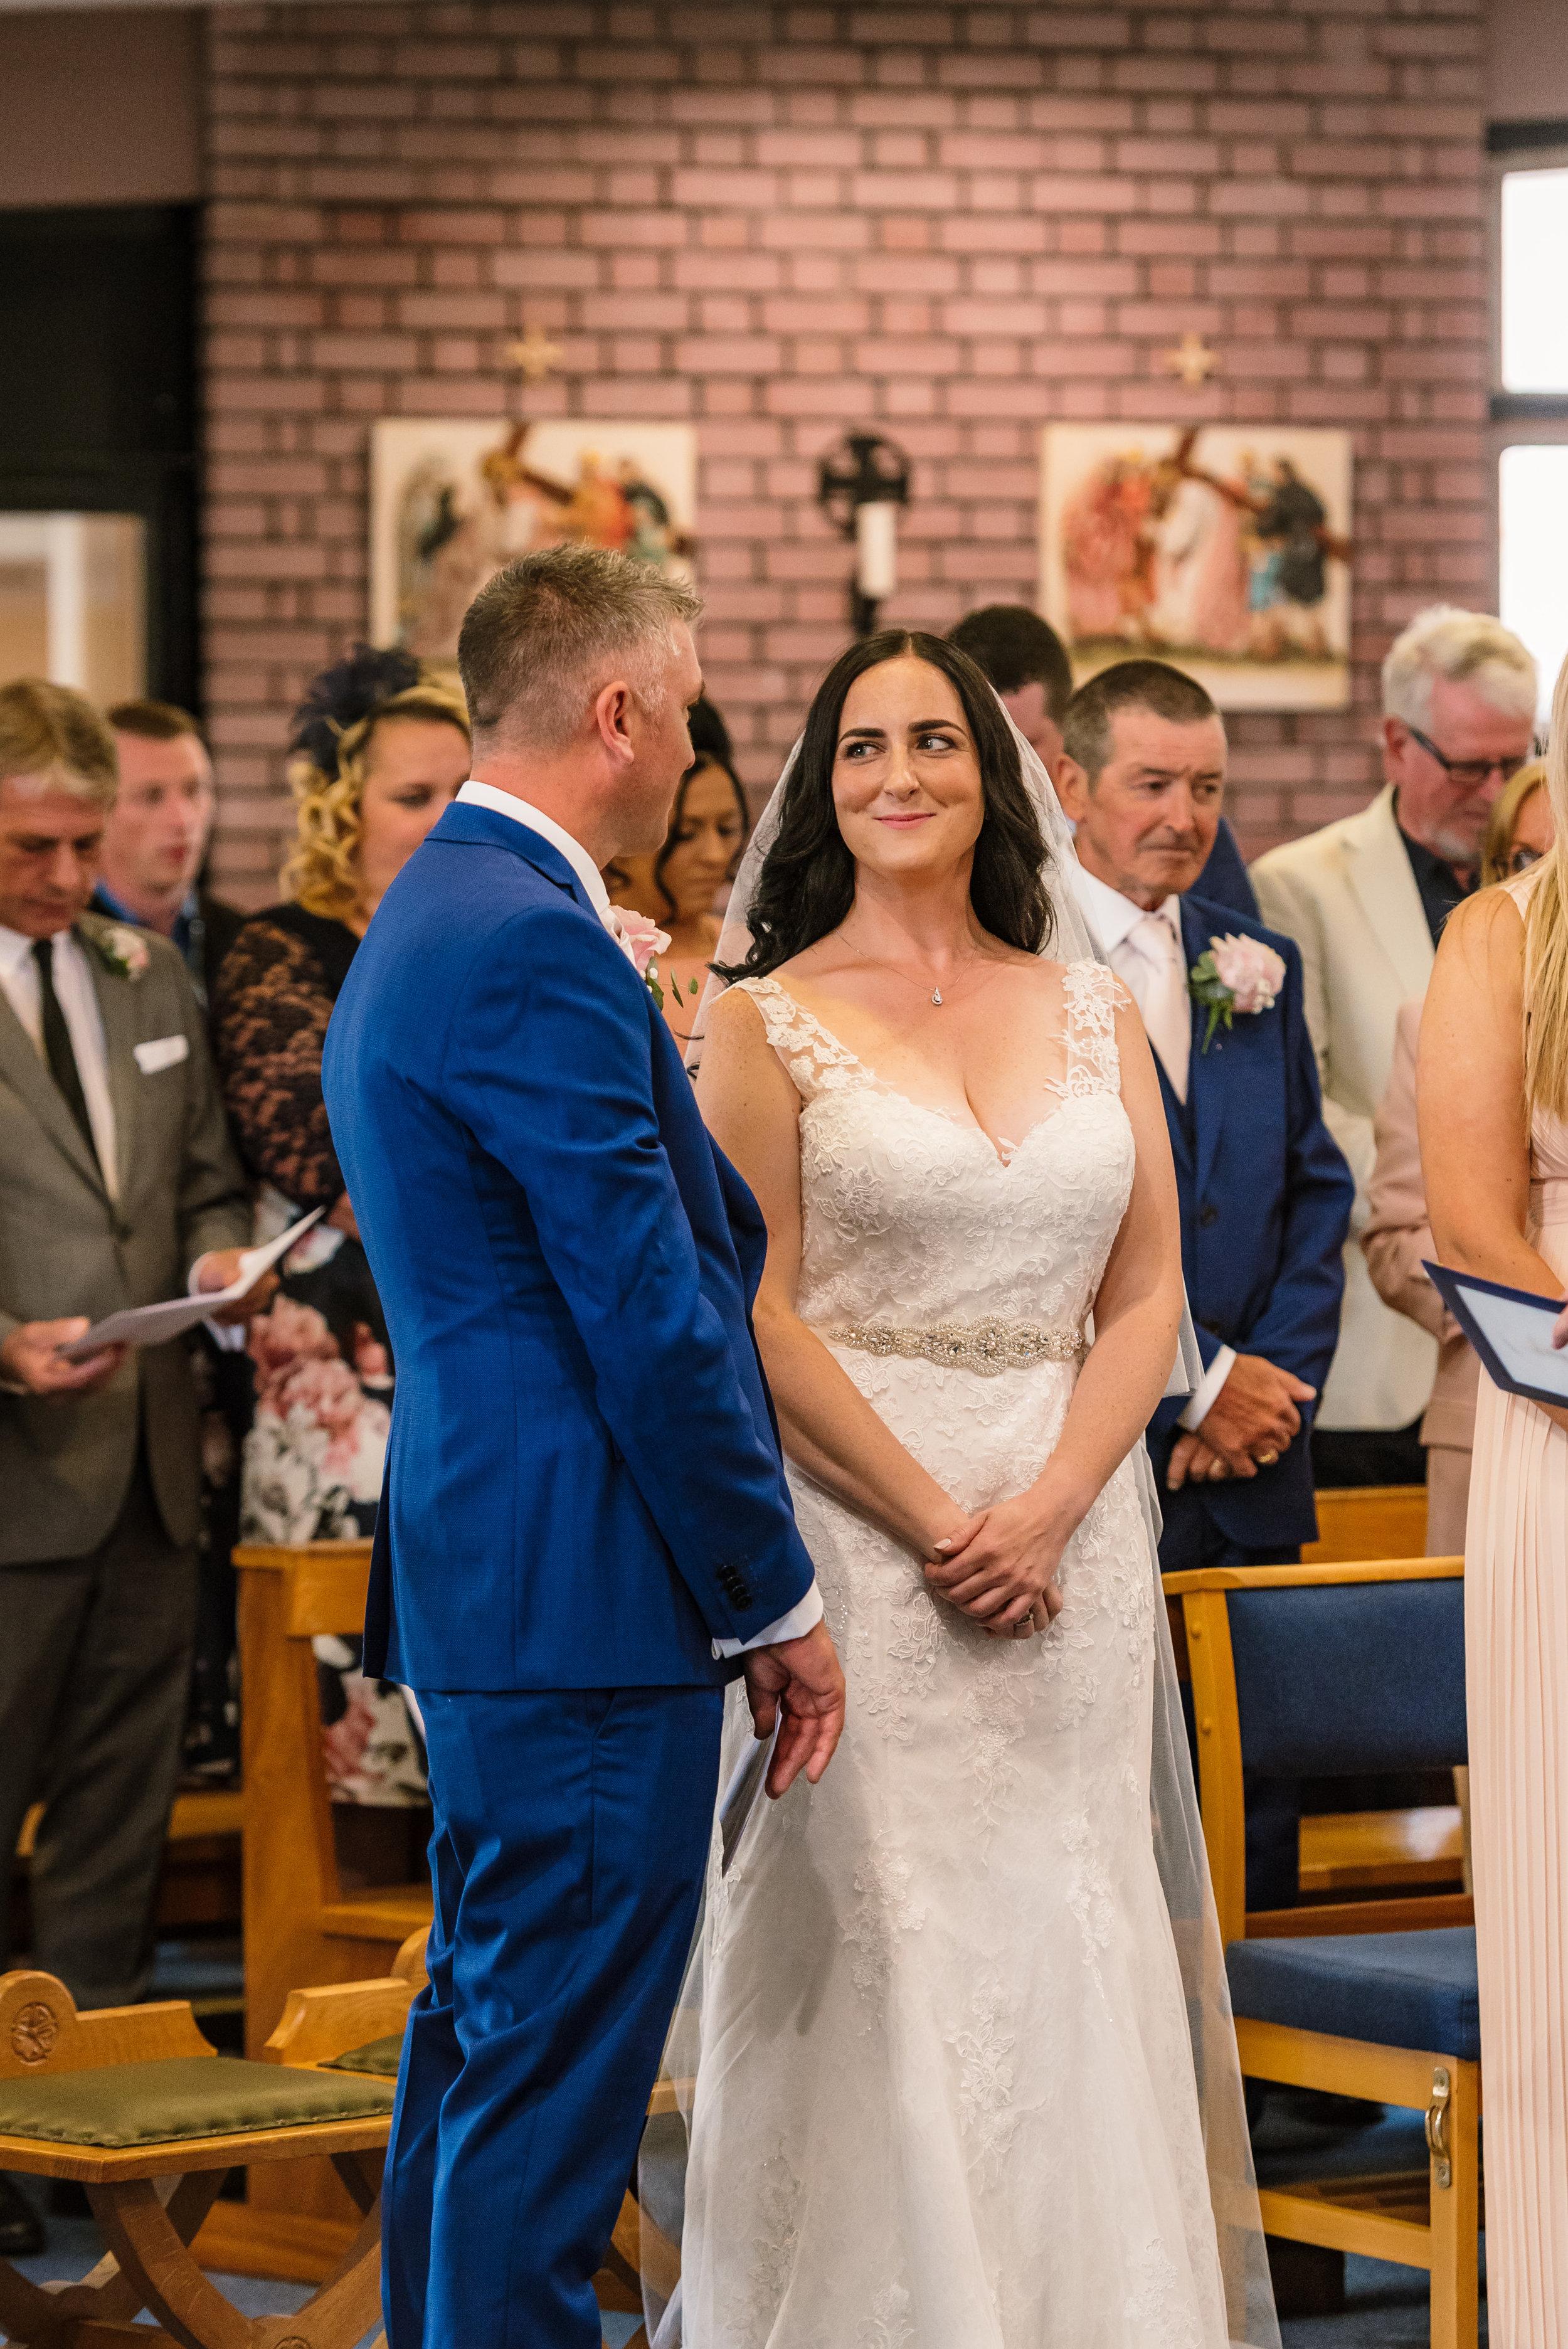 Sarah-Fishlock-Photography : Hampshire-wedding-photographer-hampshire : fleet-wedding-photographer-fleet : Meade-Hall-Wedding-Photographer : Meade-Hall-Wedding-Photos-437.jpg